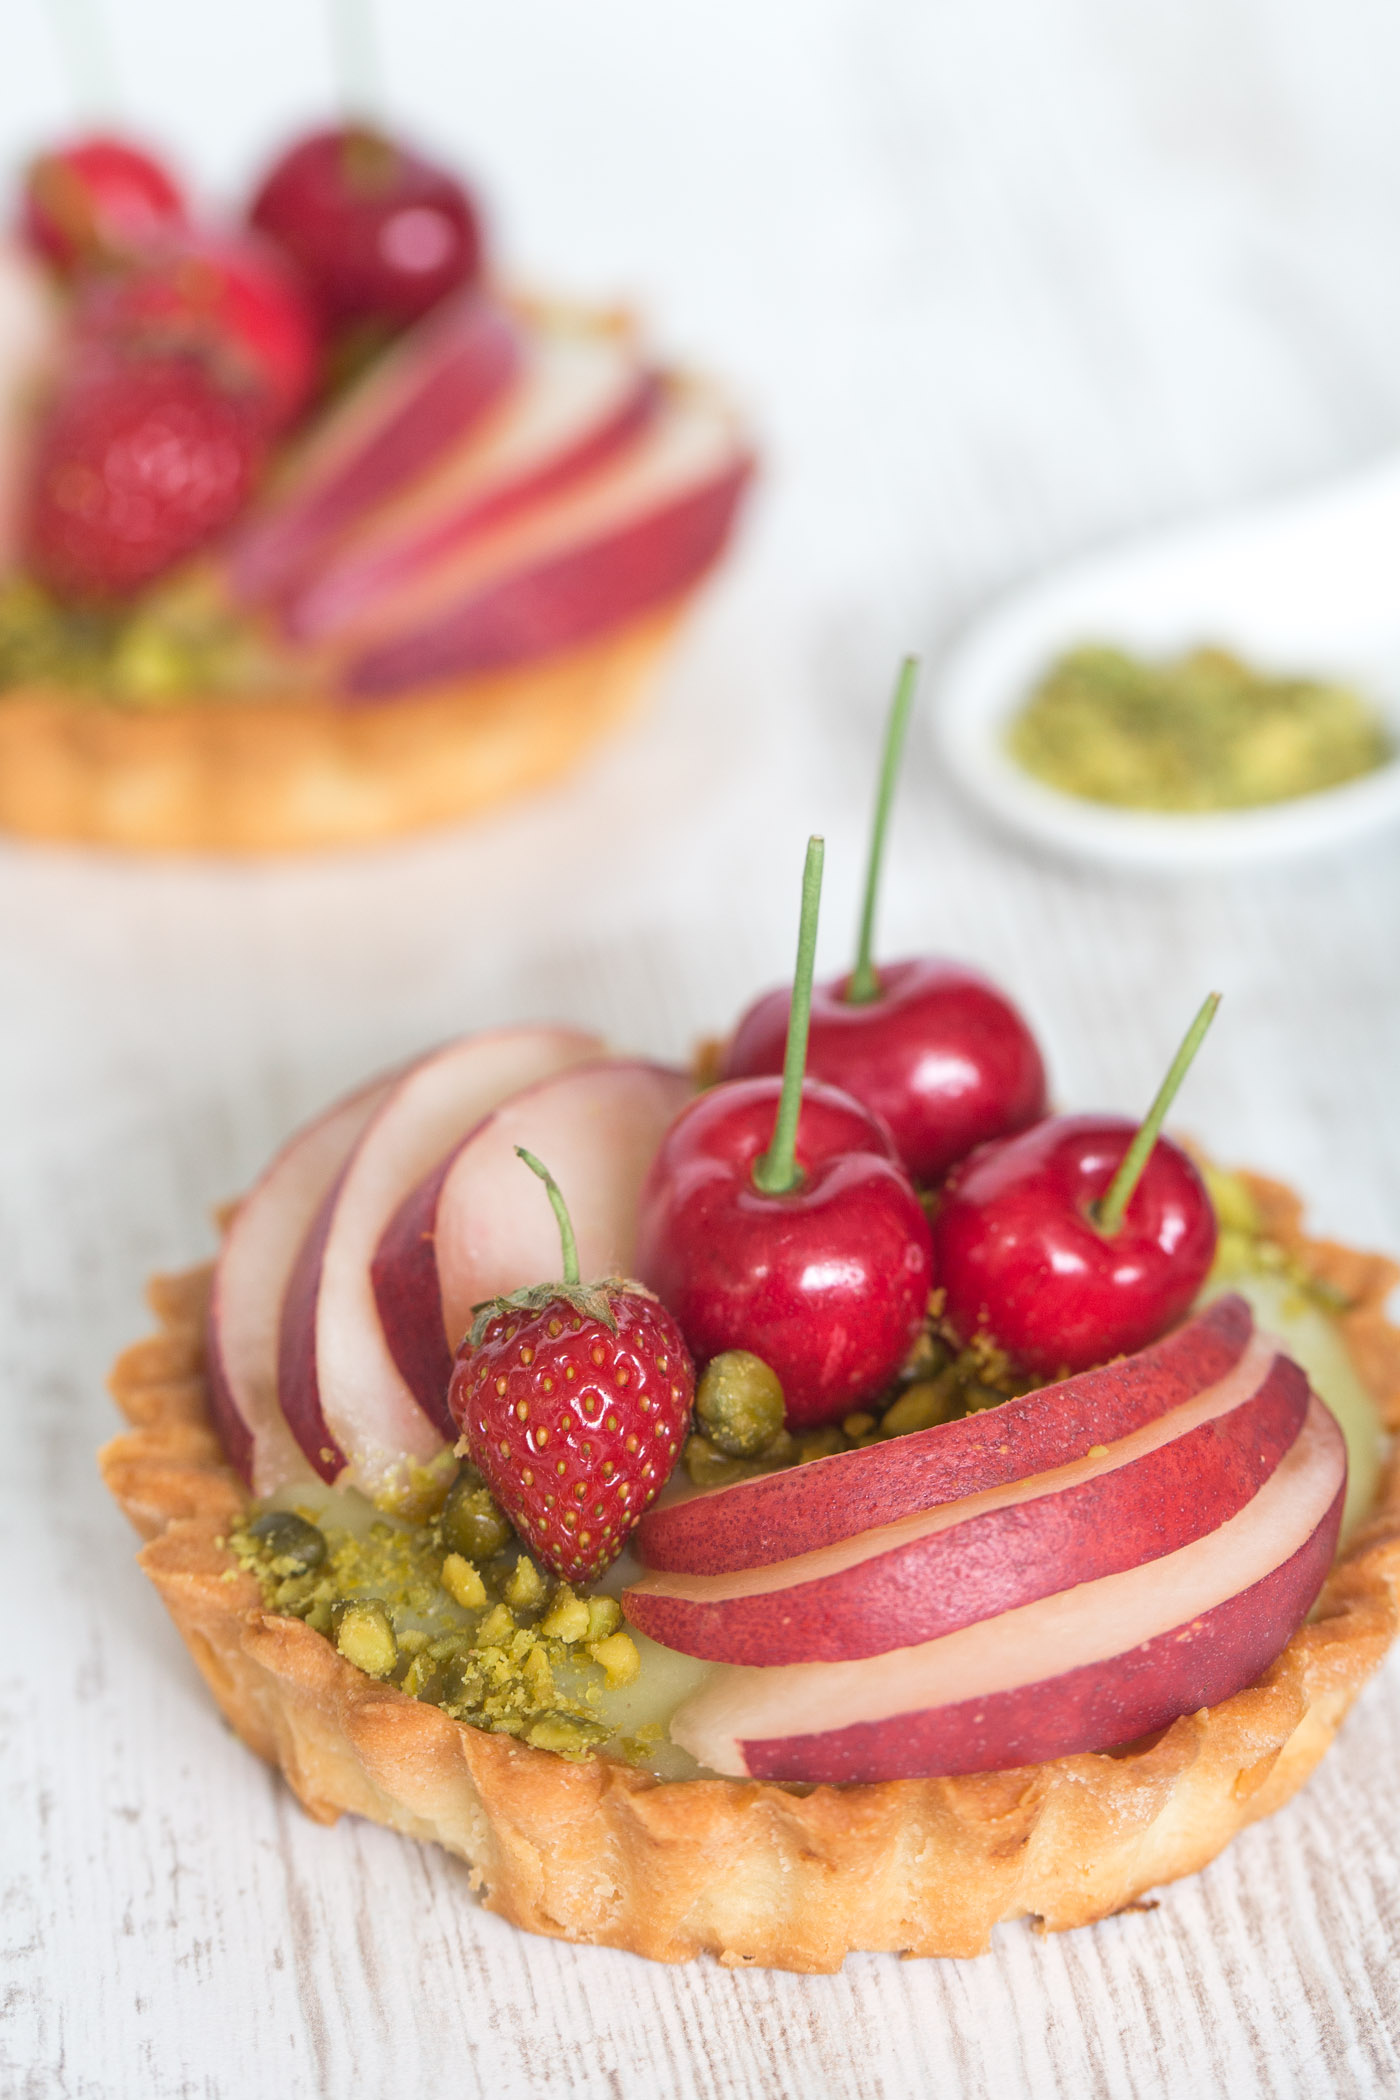 Blanccoco_Photographe_Tartelettes_pistache_fruits_styliste_culinaire-6